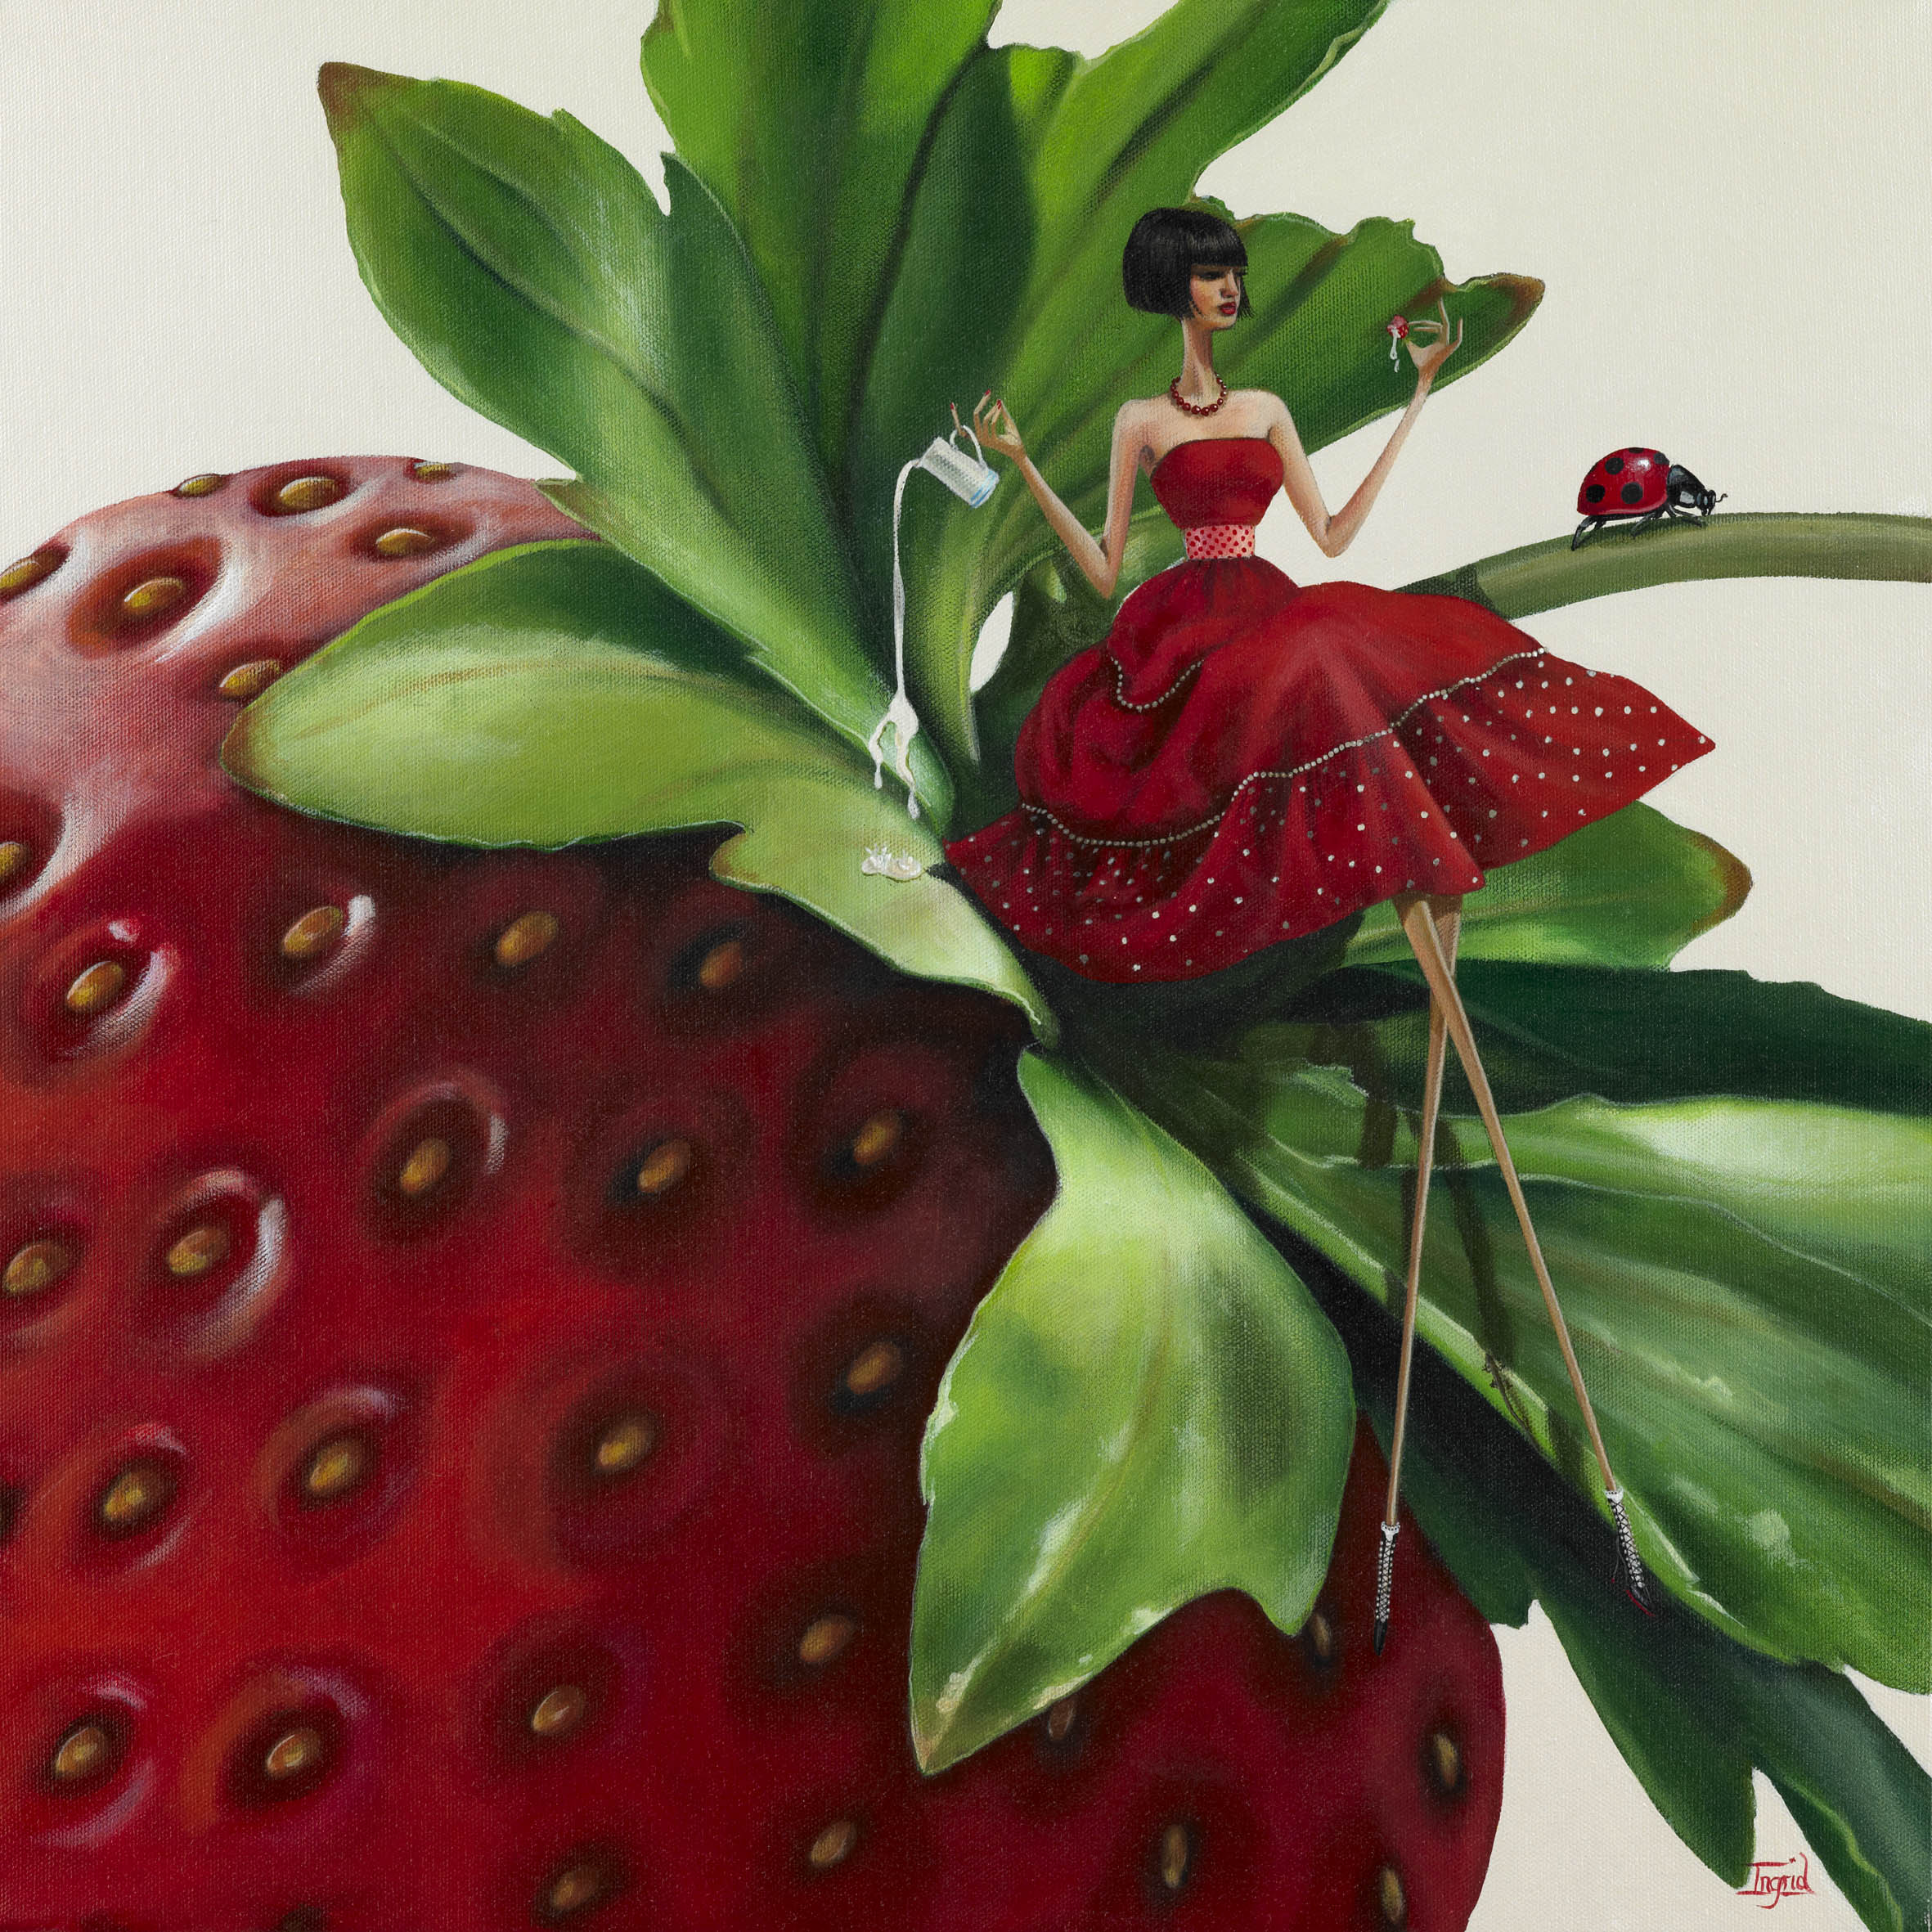 Strawberries & Cream - SOLD